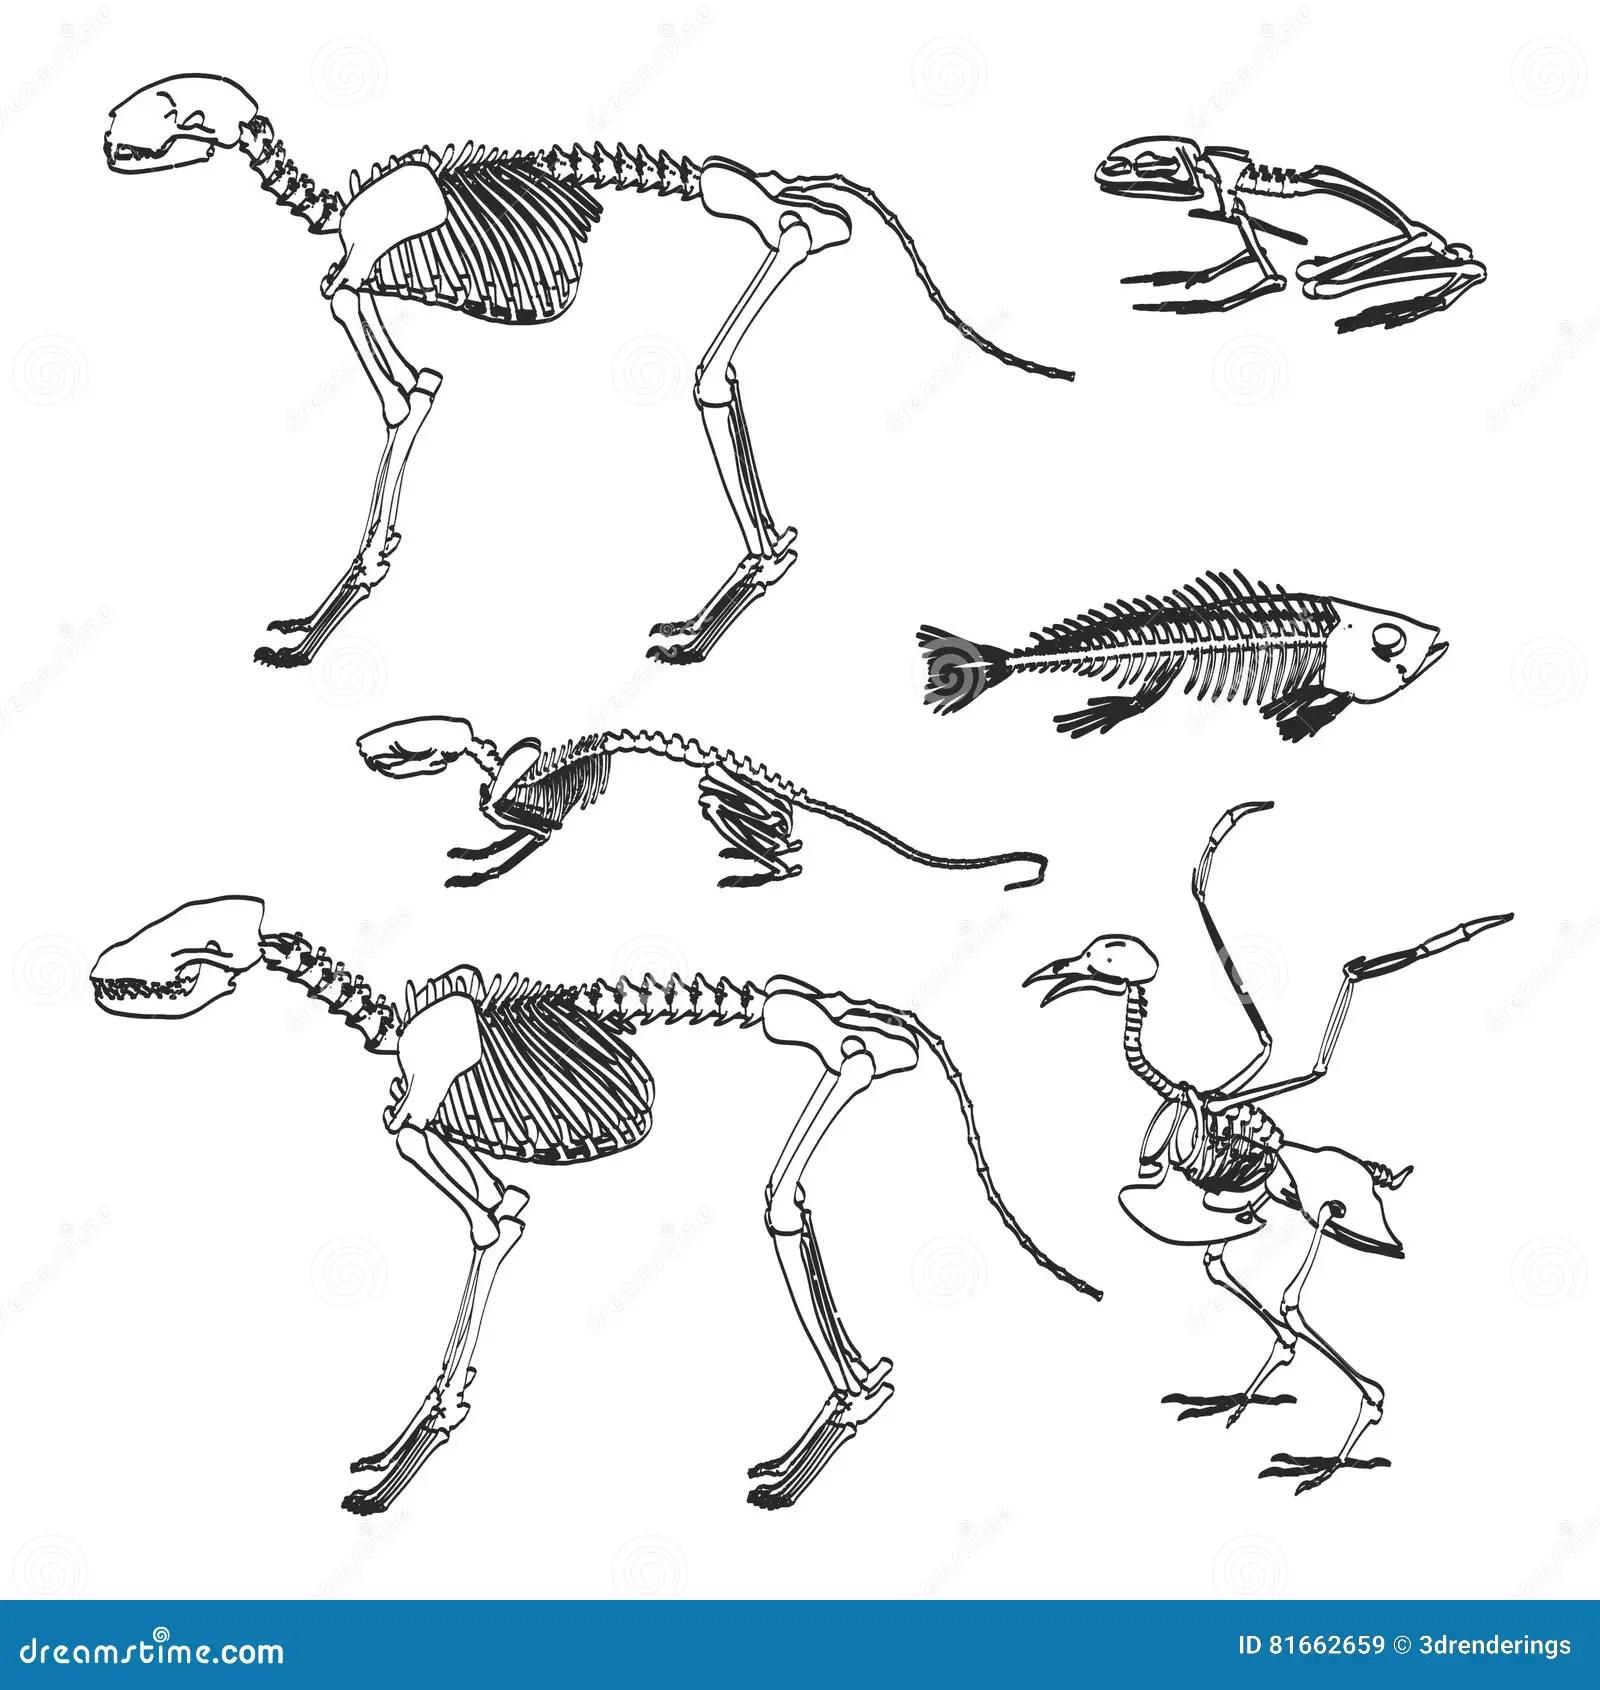 Animal skeletons stock illustration. Illustration of